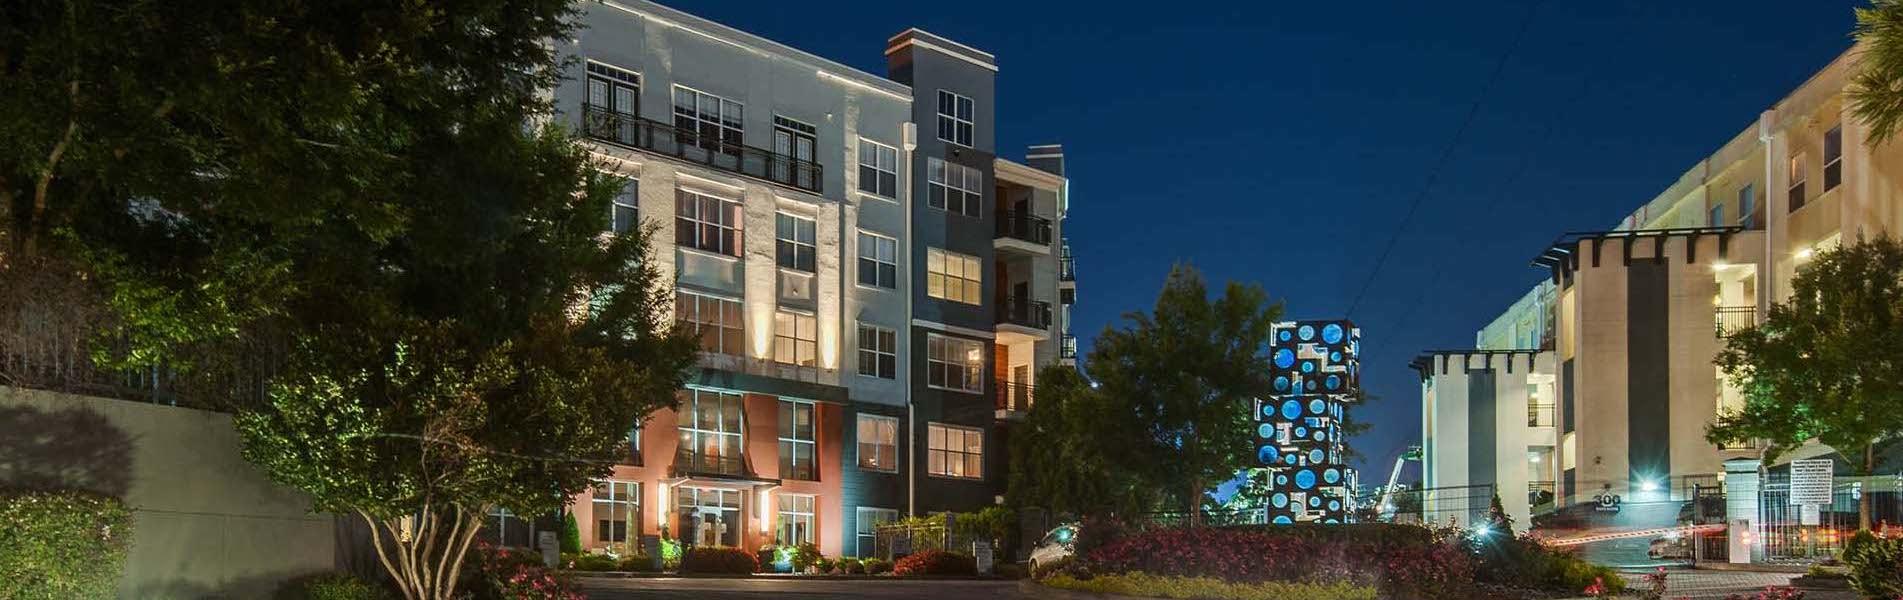 Atlanta Block Lofts For Sale